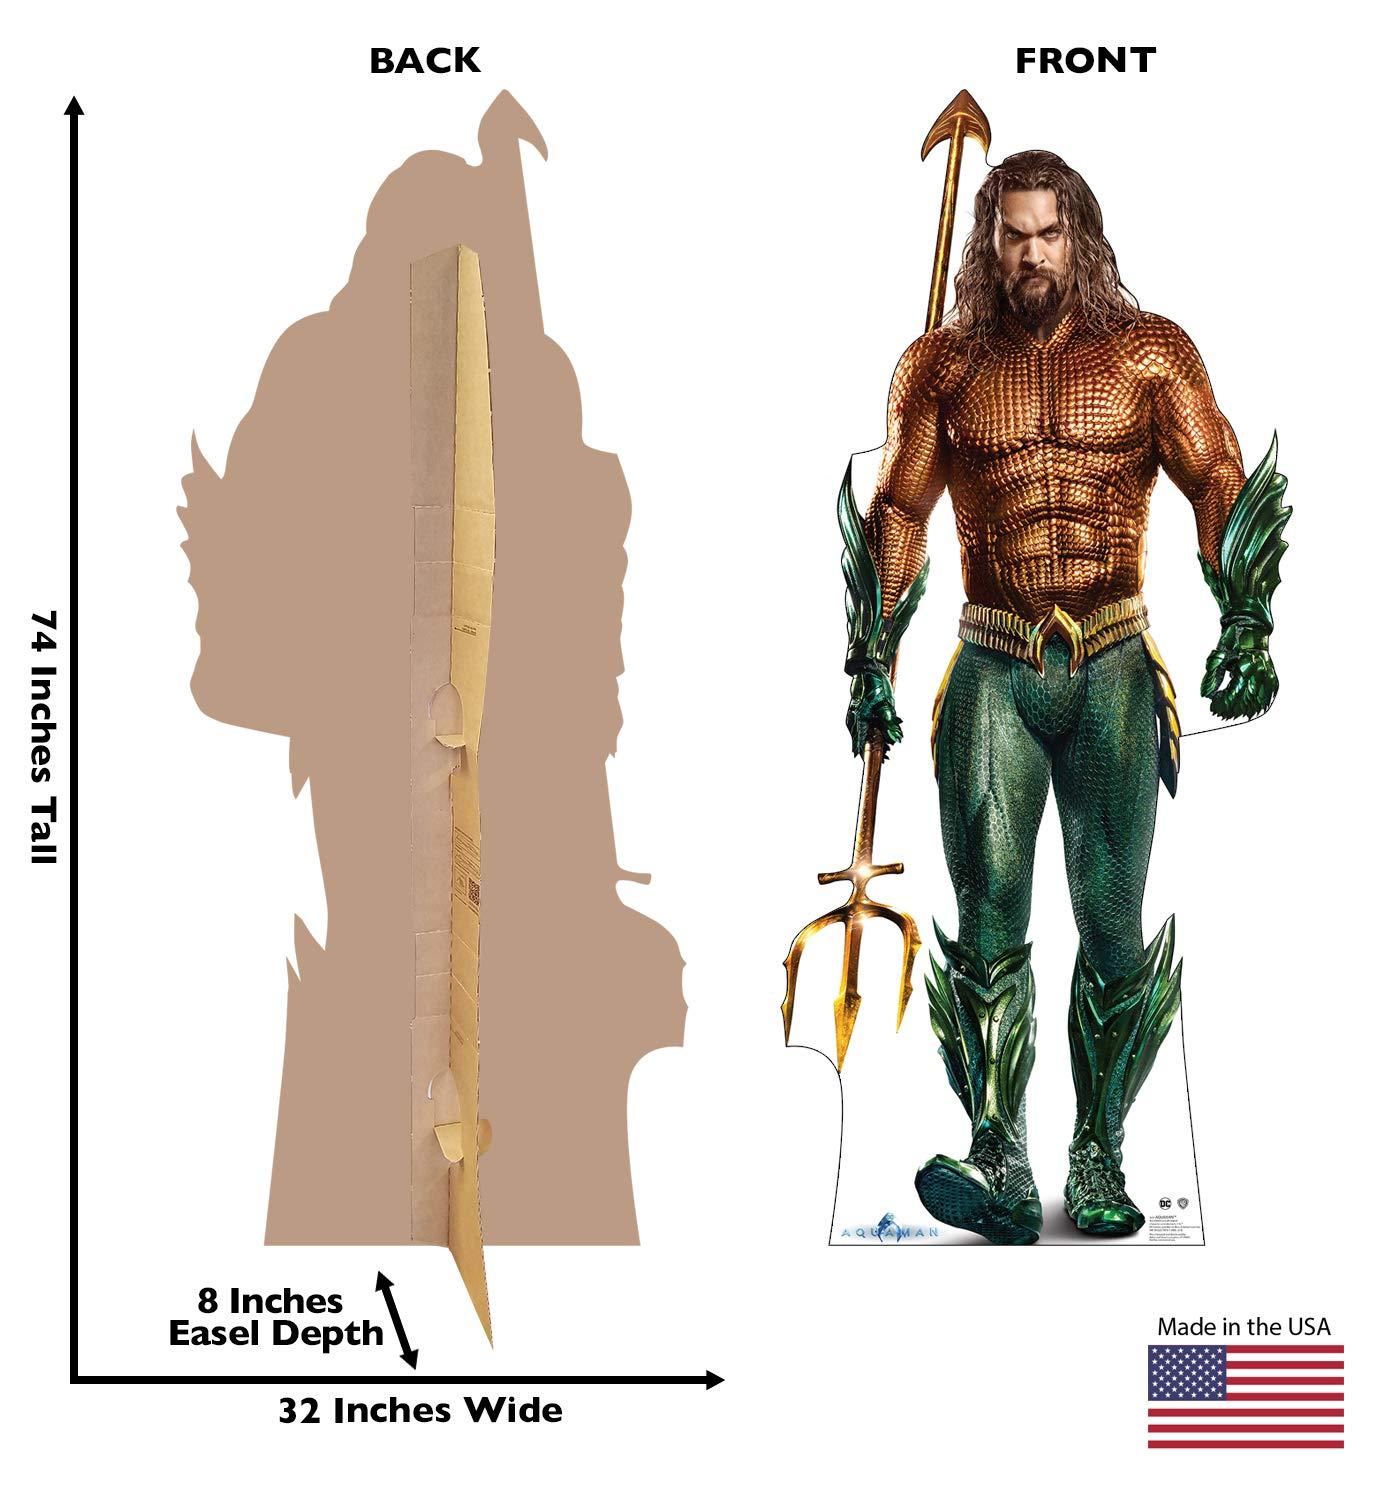 Advanced Graphics Aquaman Life Size Cardboard Cutout Standup - Aquaman (Warner Bros 2018 Film) by Advanced Graphics (Image #2)